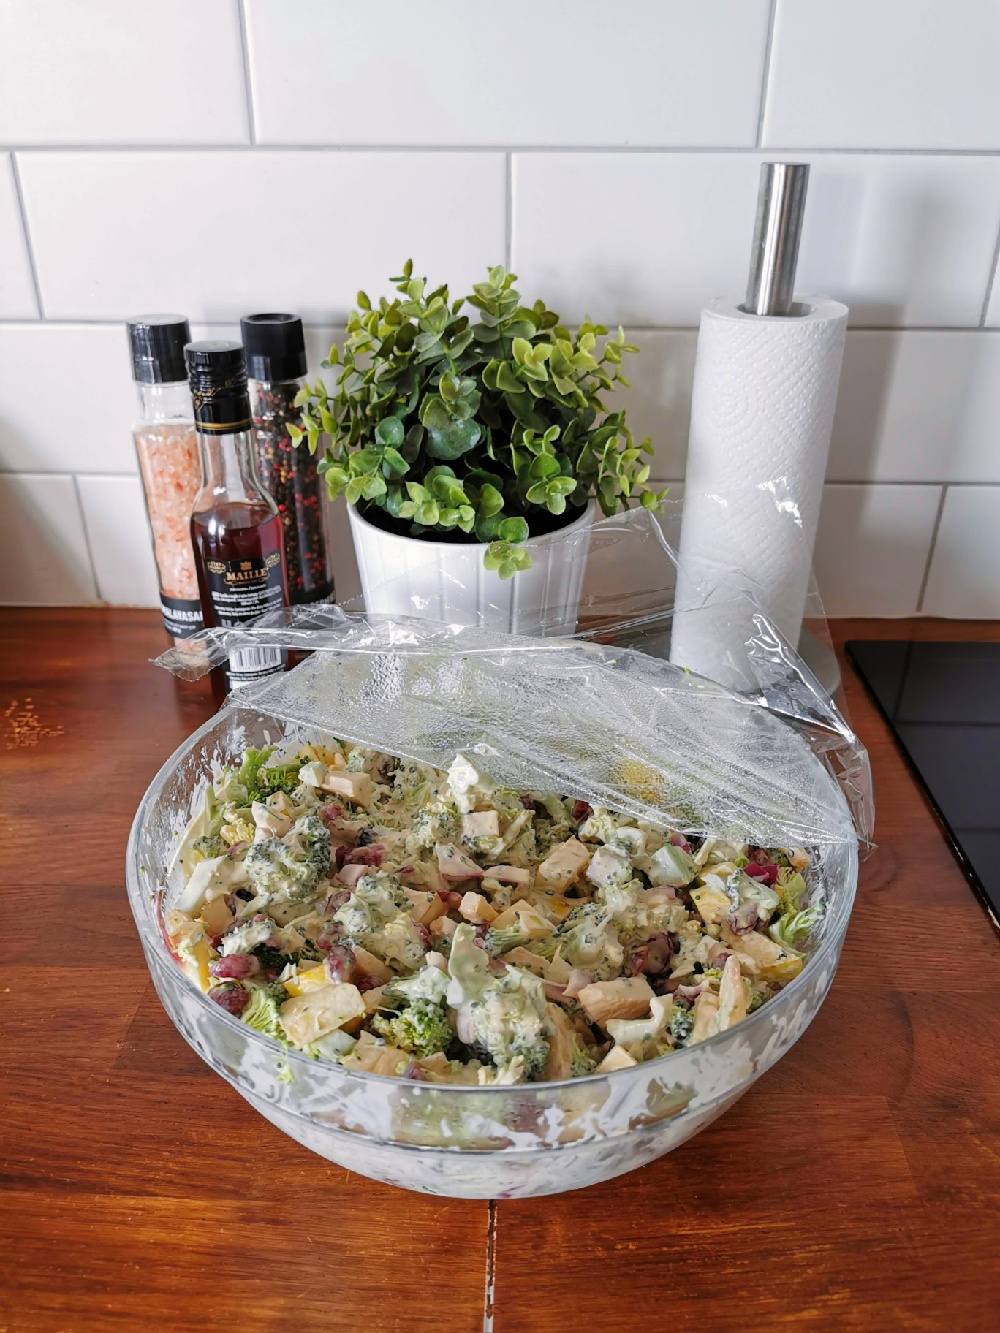 brokkolisalat trinegrung 3.jpg